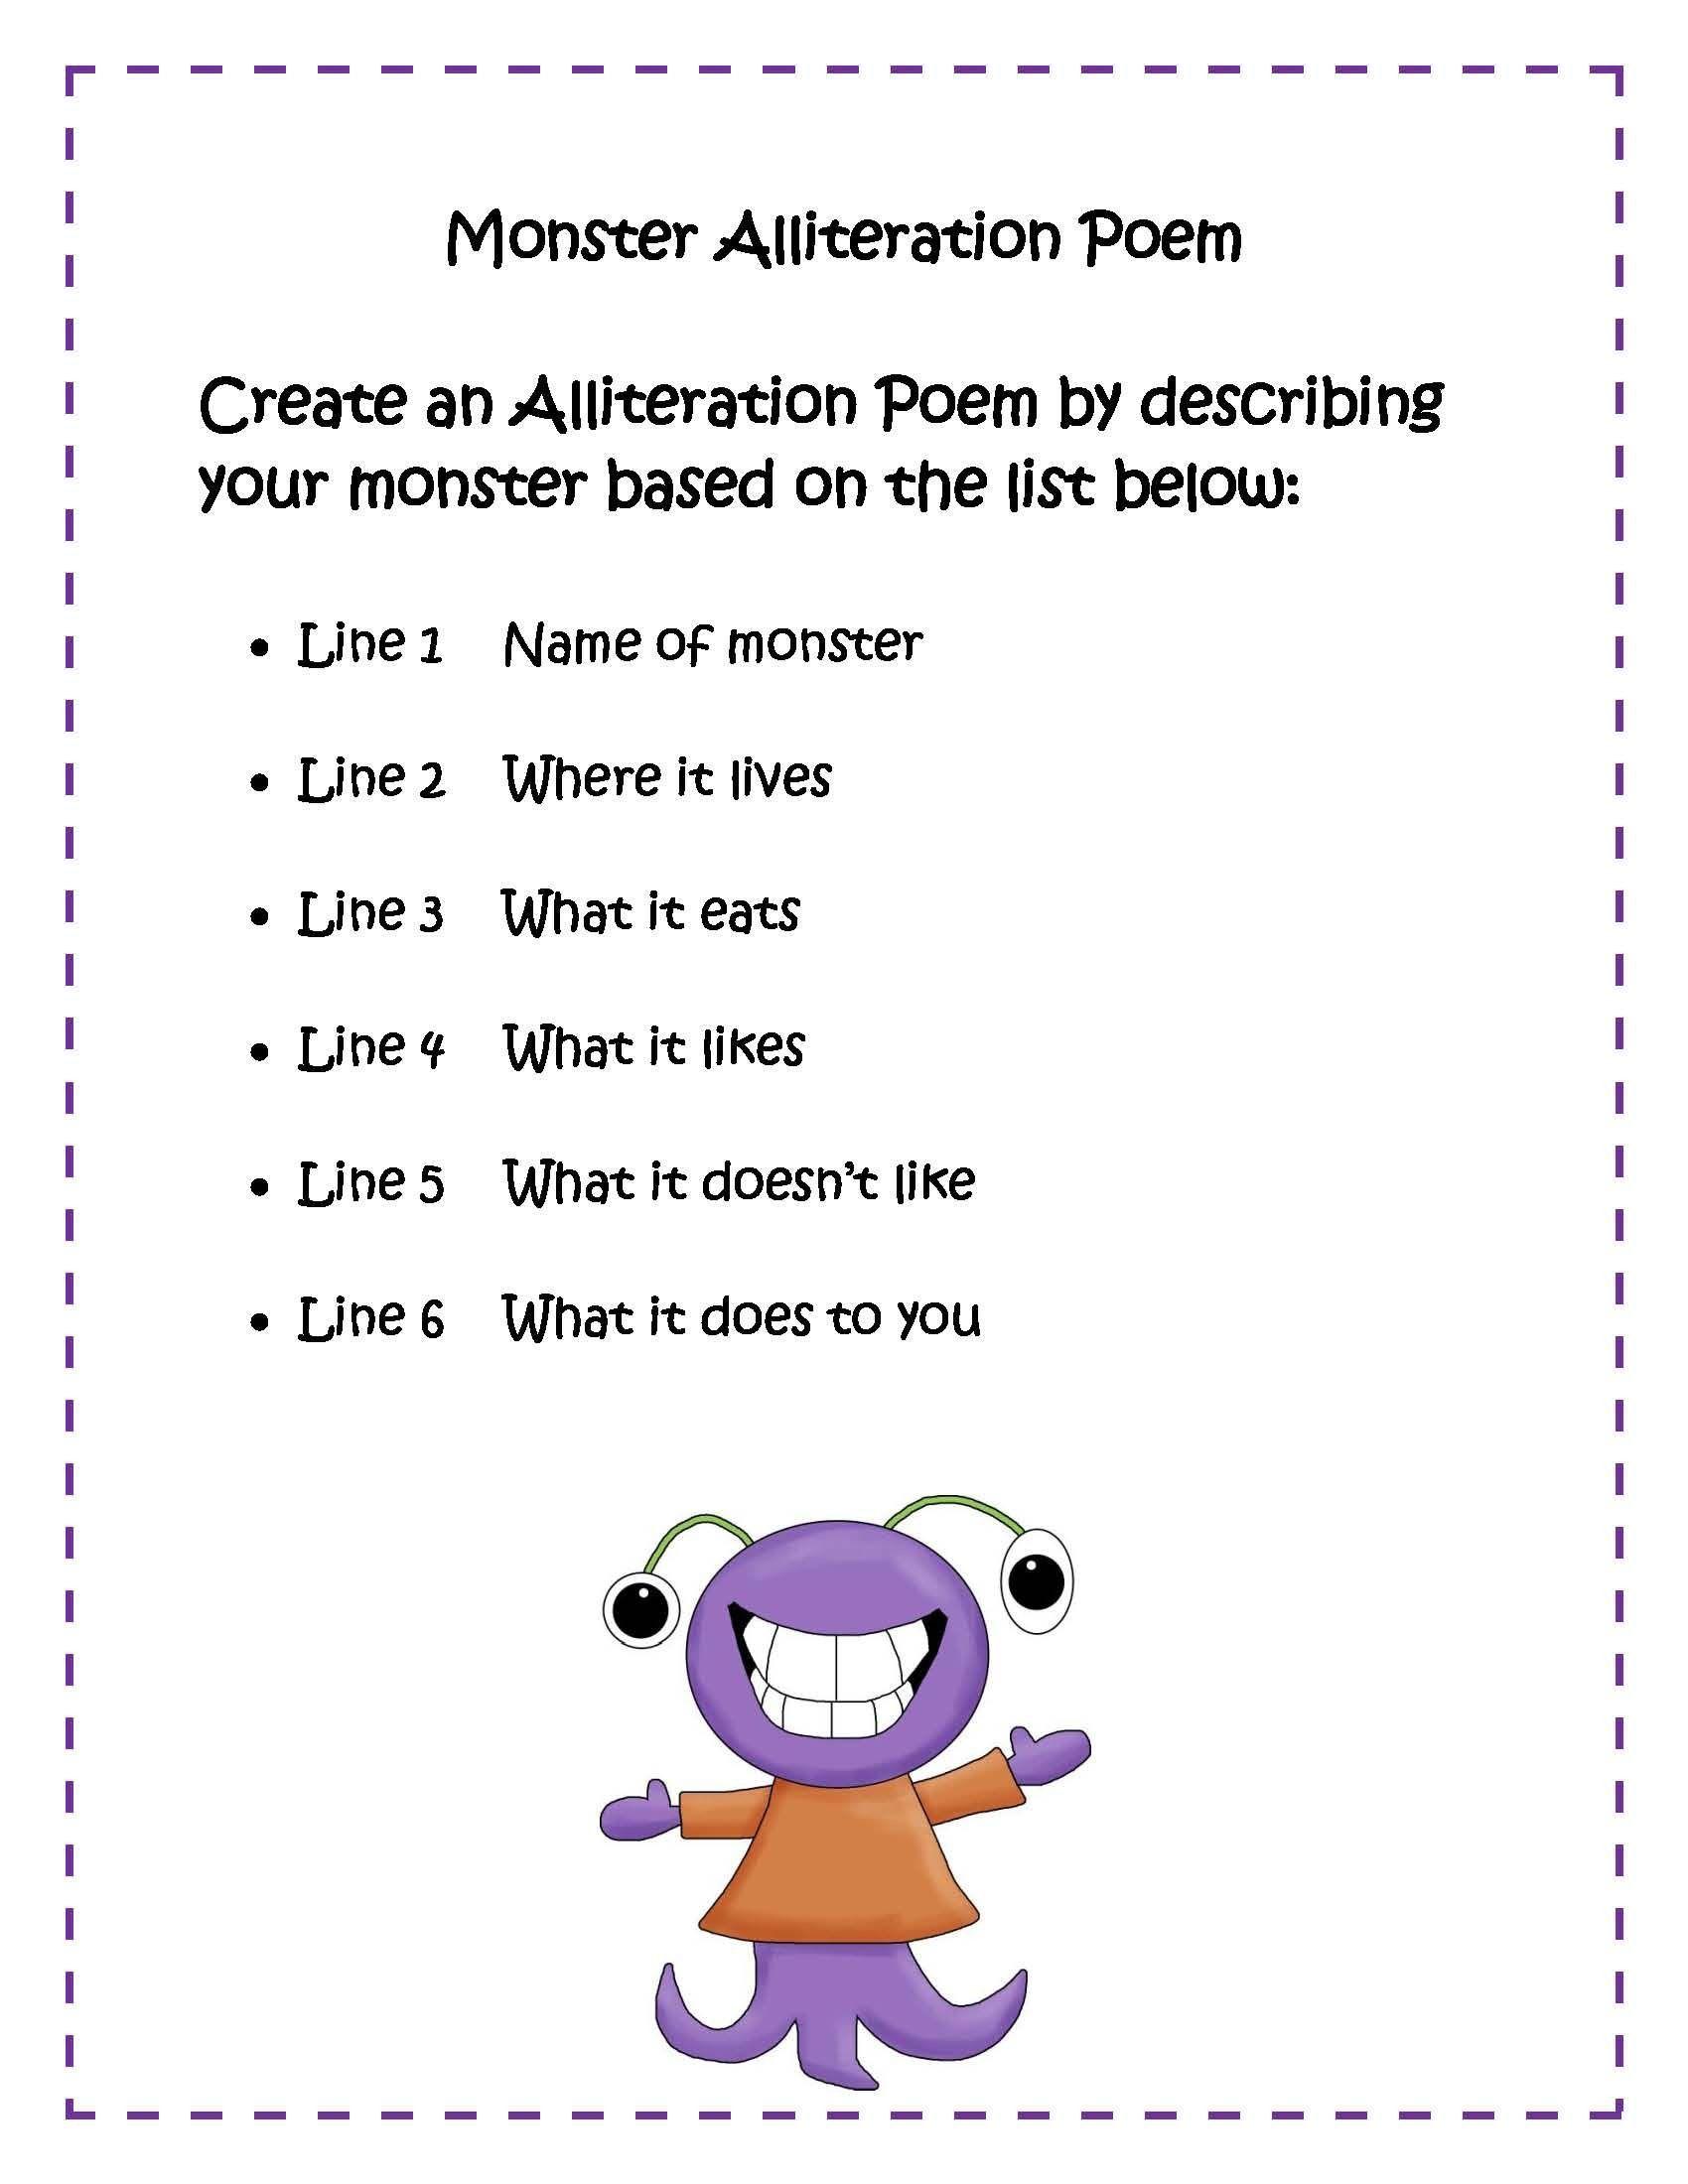 Alliteration Worksheets 4th Grade Alliteration Poems Kids Blends Google Search In 2021 Alliteration Poems In 2021 Alliteration Poems Alliteration Kindergarten Writing [ 2200 x 1700 Pixel ]